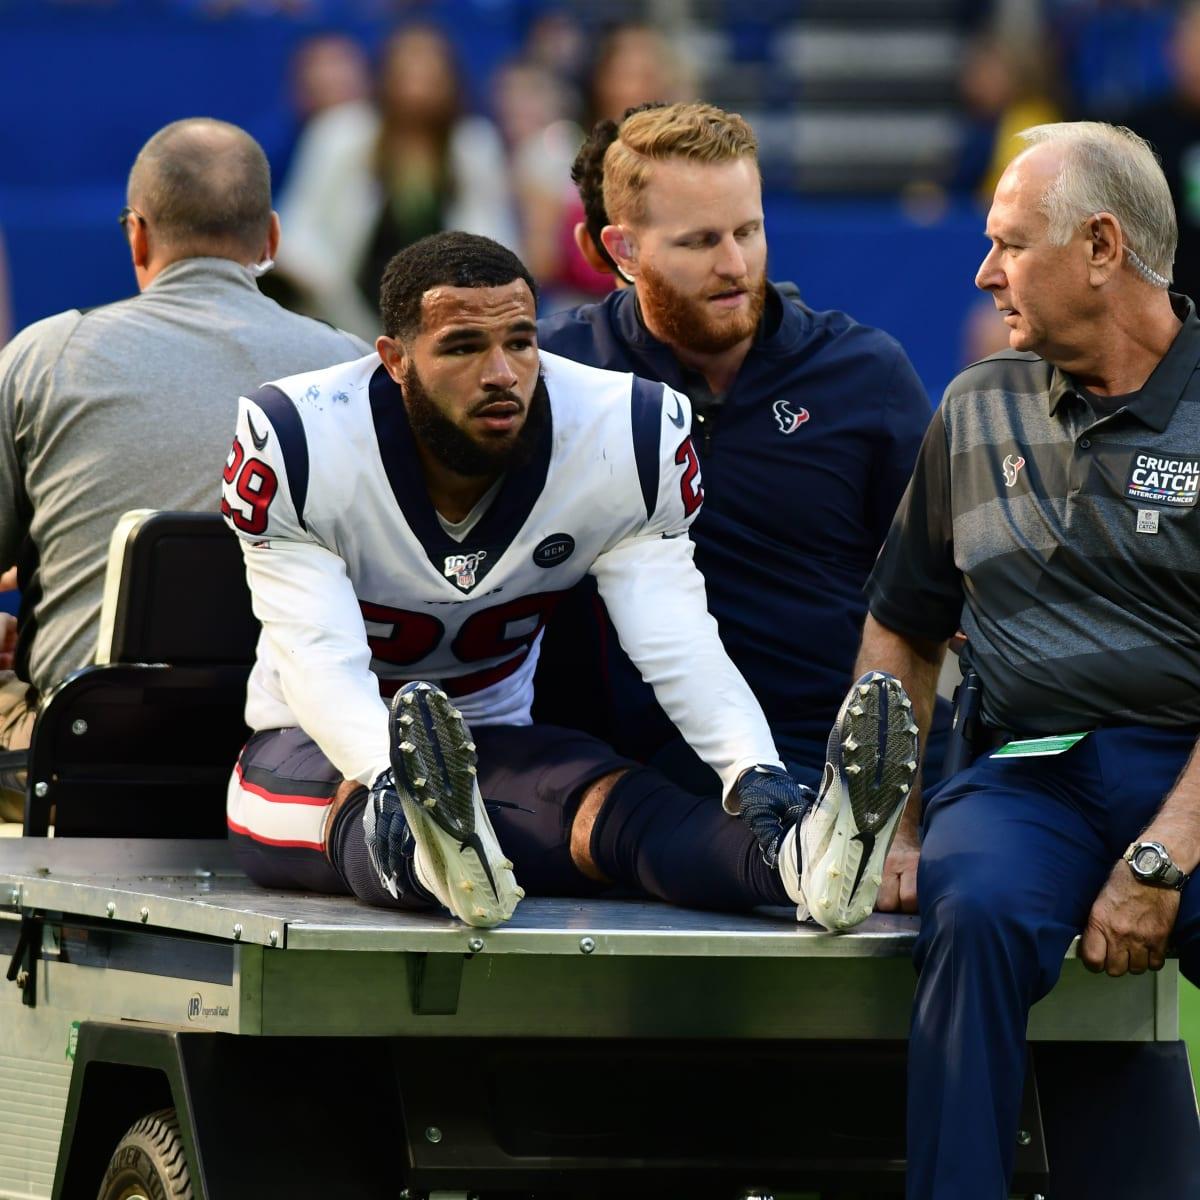 Houston Texans Cornerback Phillip Gaines Season Comes to an End ...